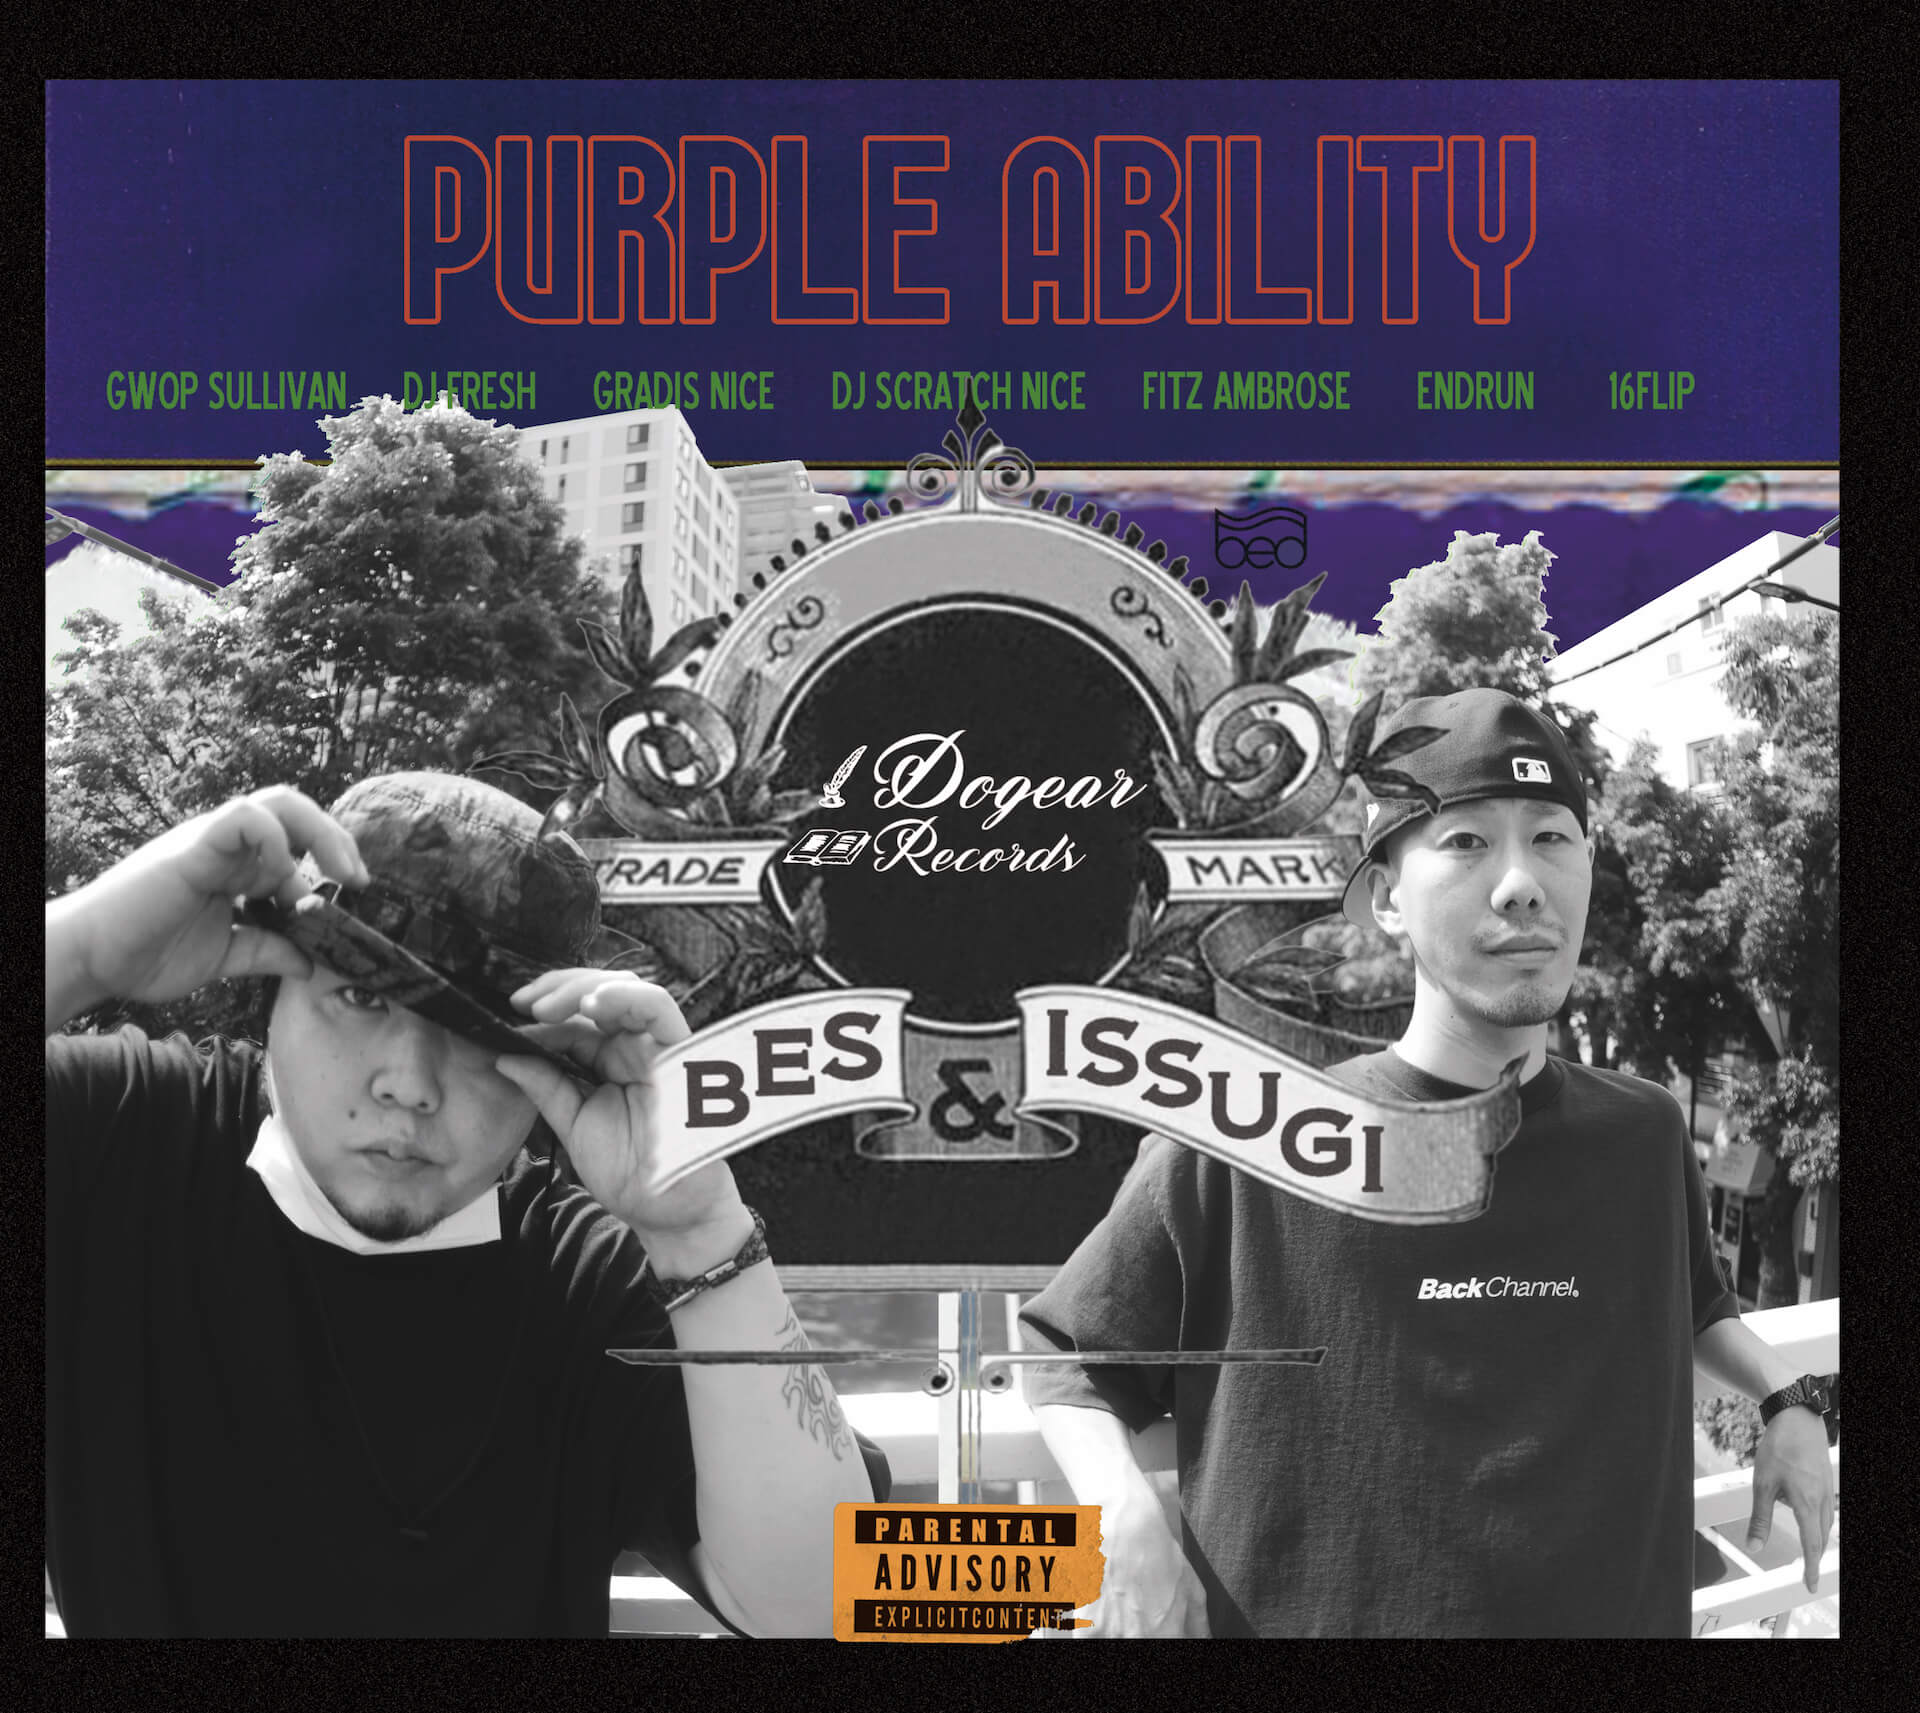 BES & ISSUGIの再タッグが実現!ジョイント・アルバム第2弾『Purple Ability』リリース決定|Mr.PUG、仙人掌、STICKYが客演参加 music200619_bes_issugi_1